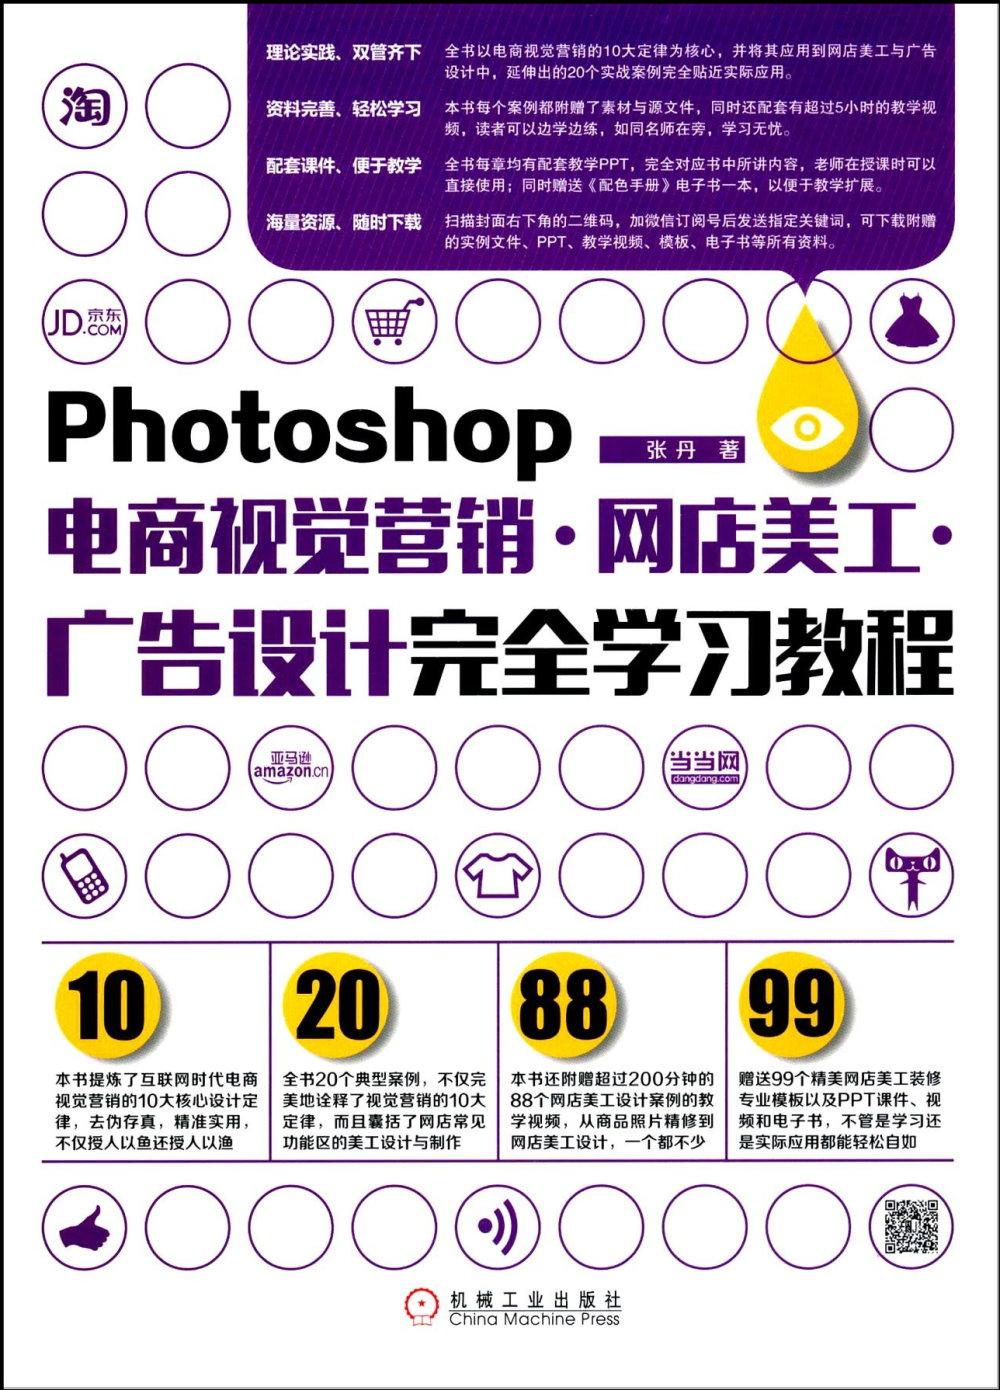 Photoshop電商視覺營銷·網店美工·廣告設計完全學習教程